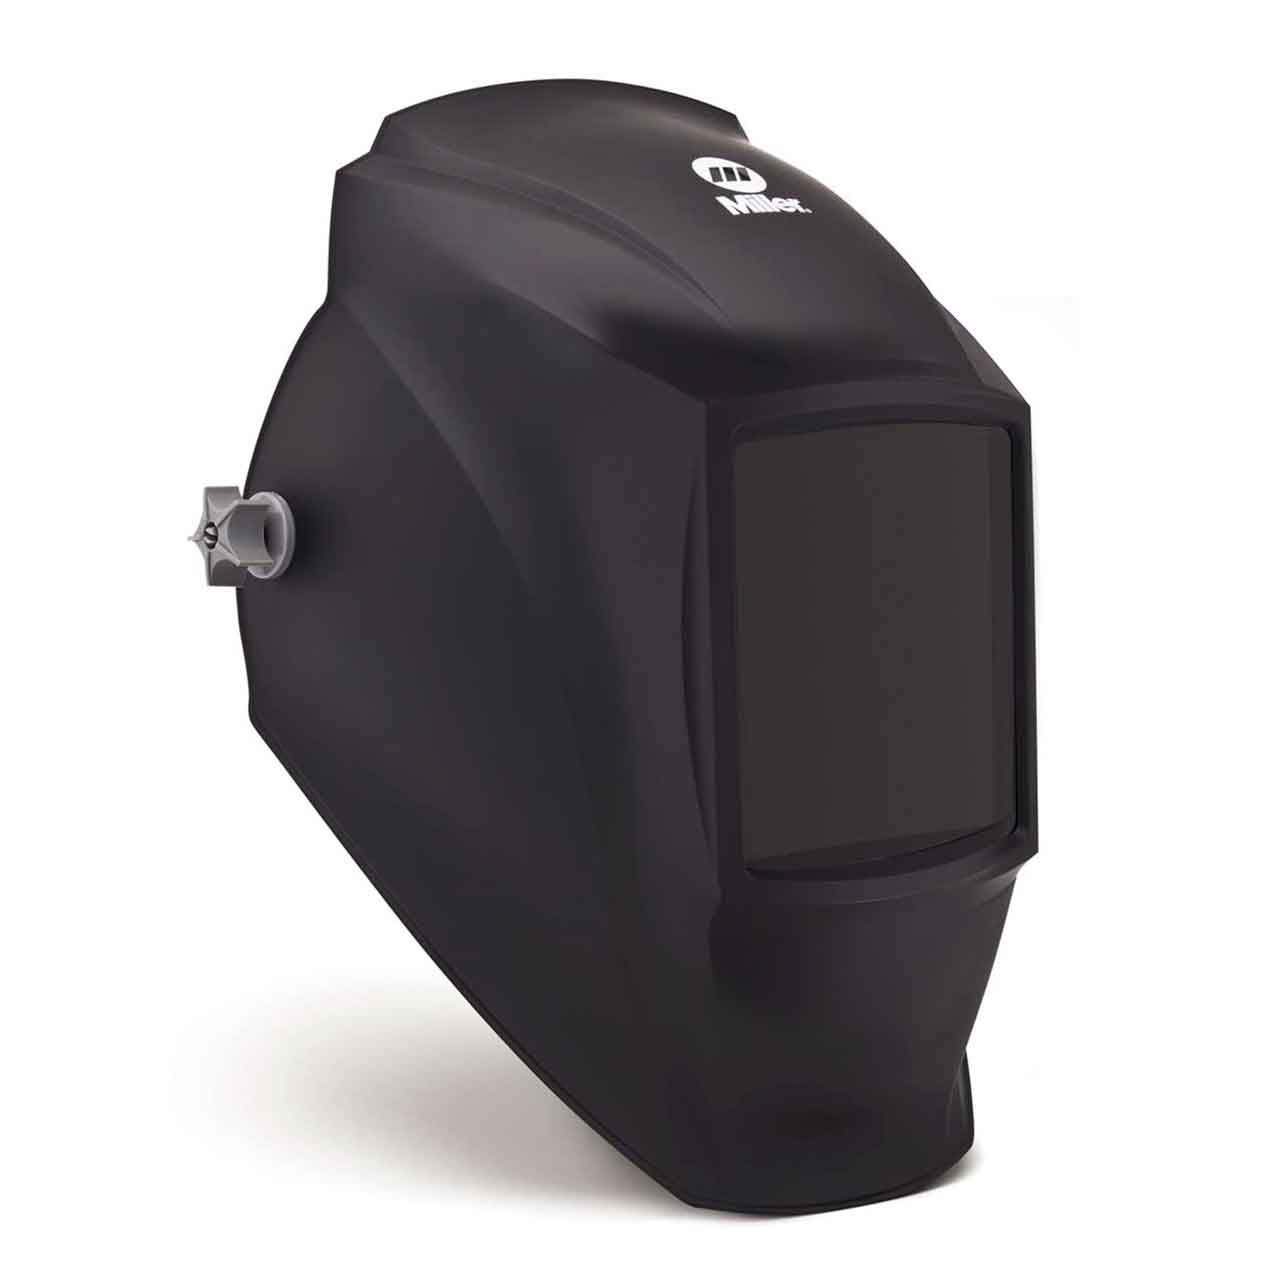 Passive Welding Helmet 8 to 12 Lens Shade Black Classic MP-10